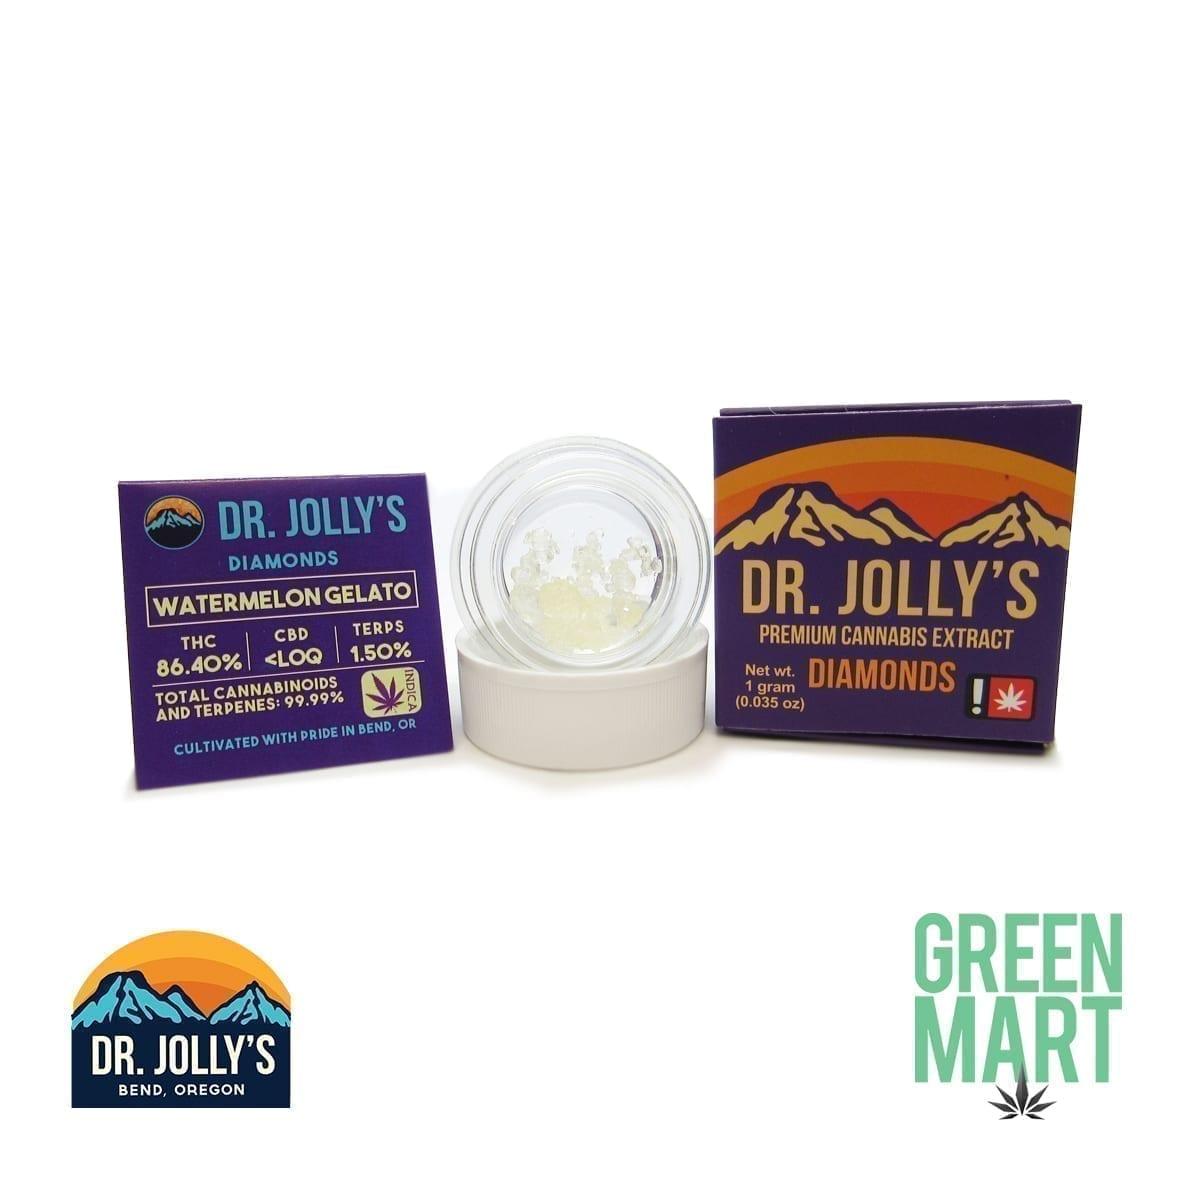 Dr. Jolly's Extracts - Watermelon Gelato Diamonds